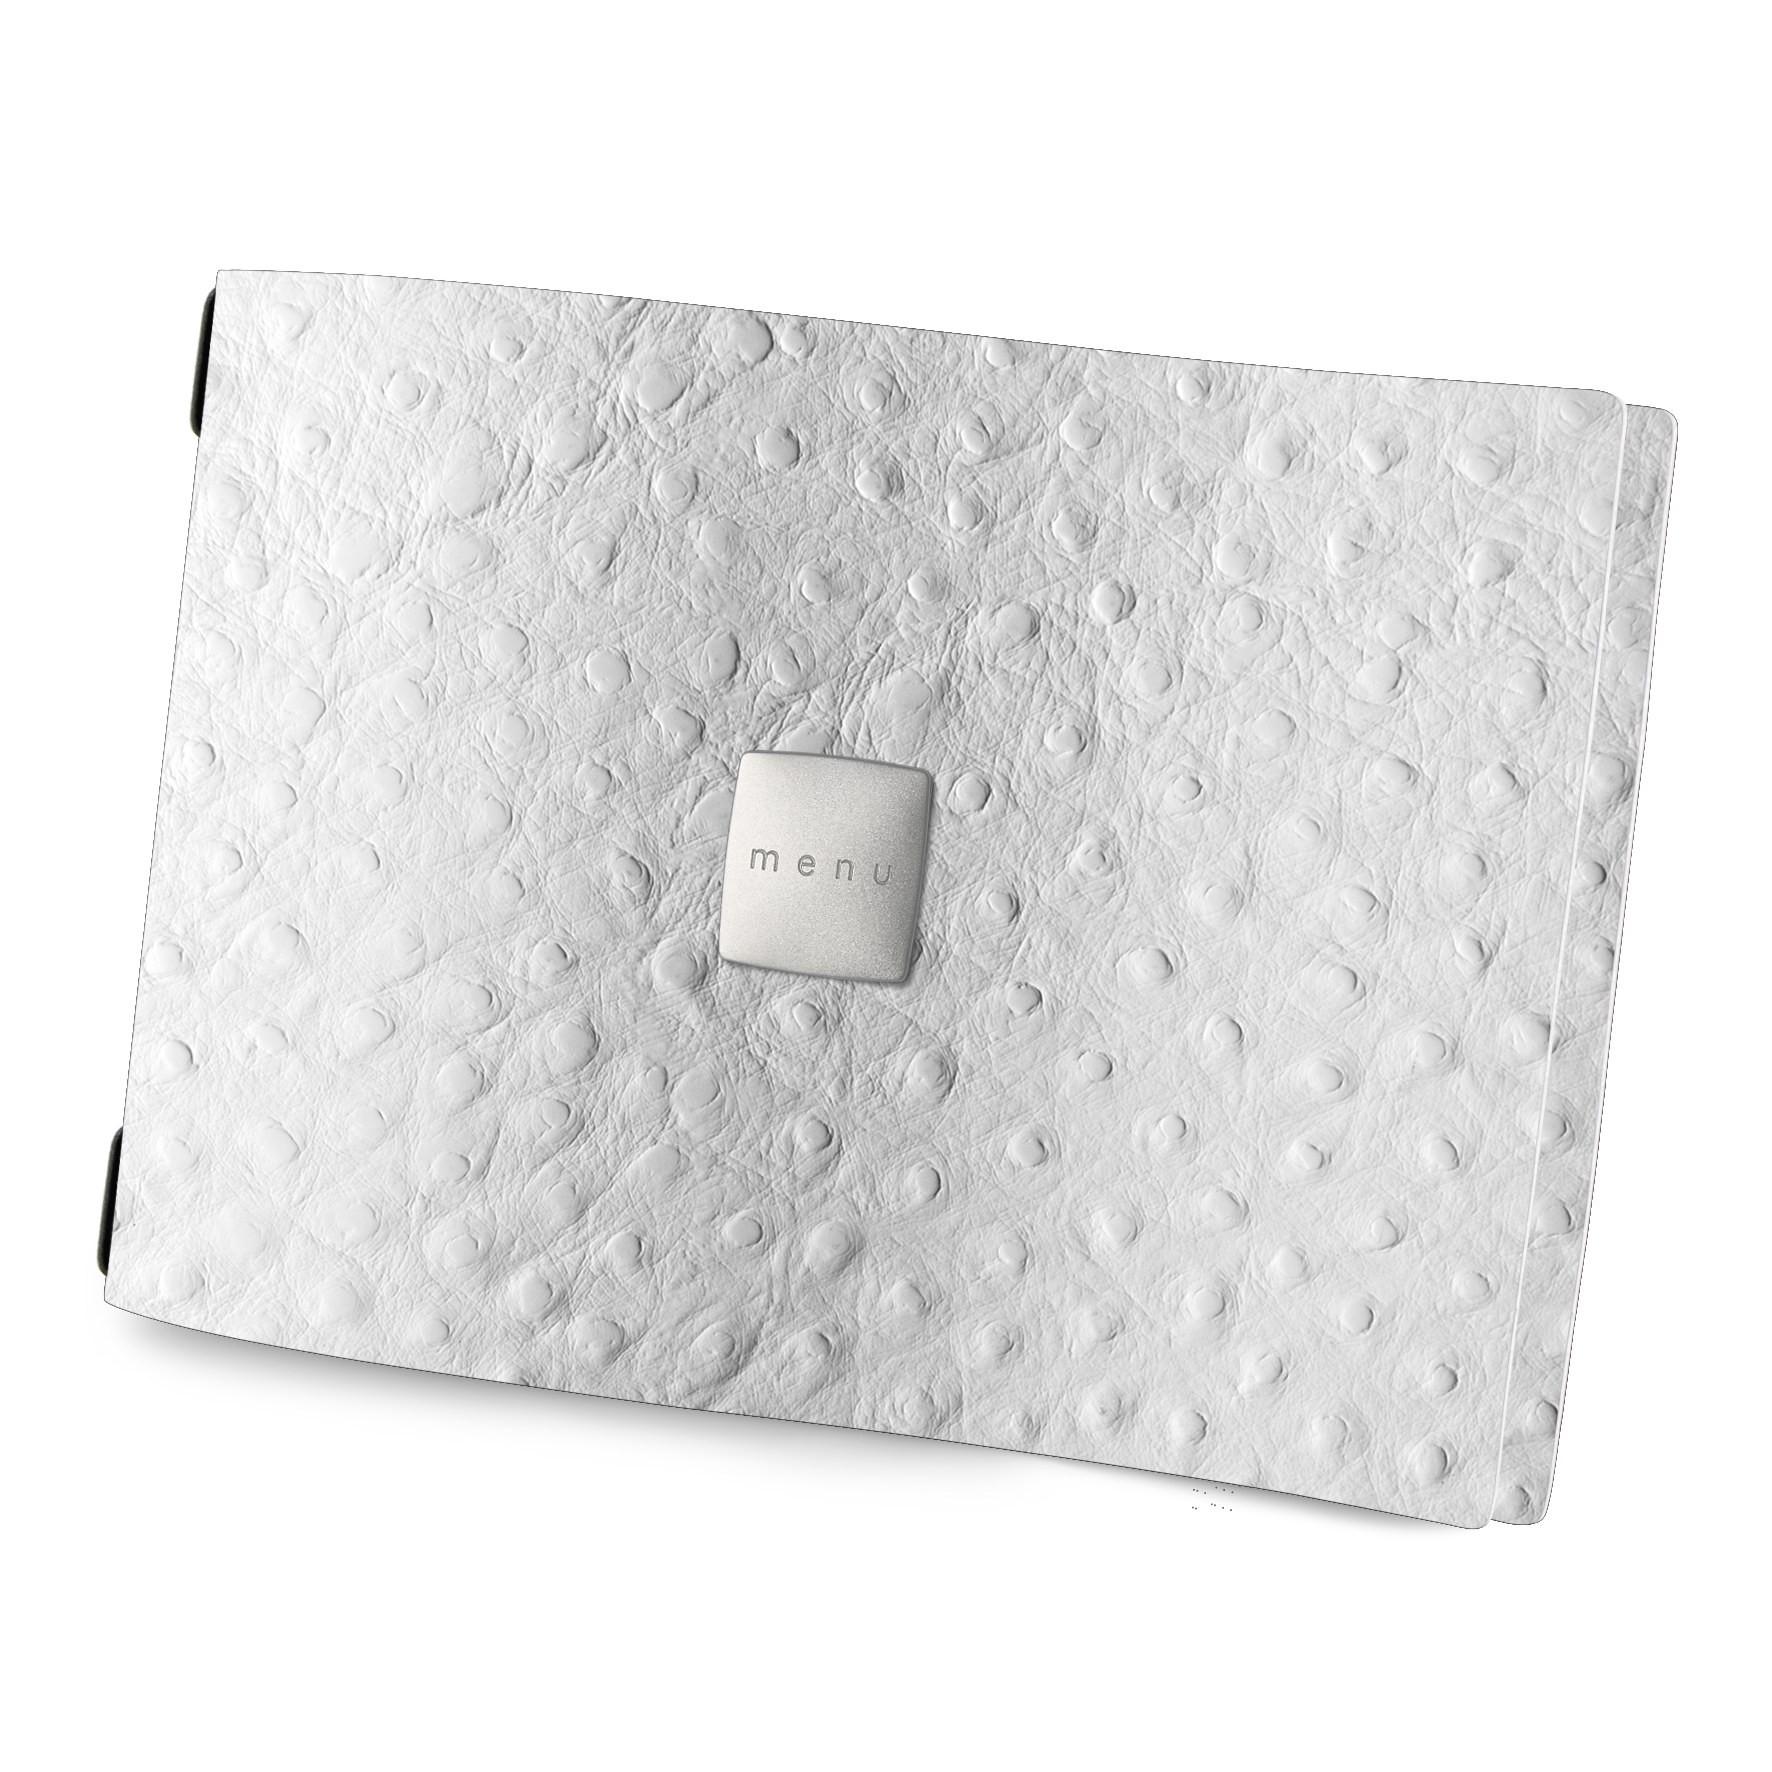 Protège menu A4 HORIZONTAL Fashion blanc aspect peau d'autruche